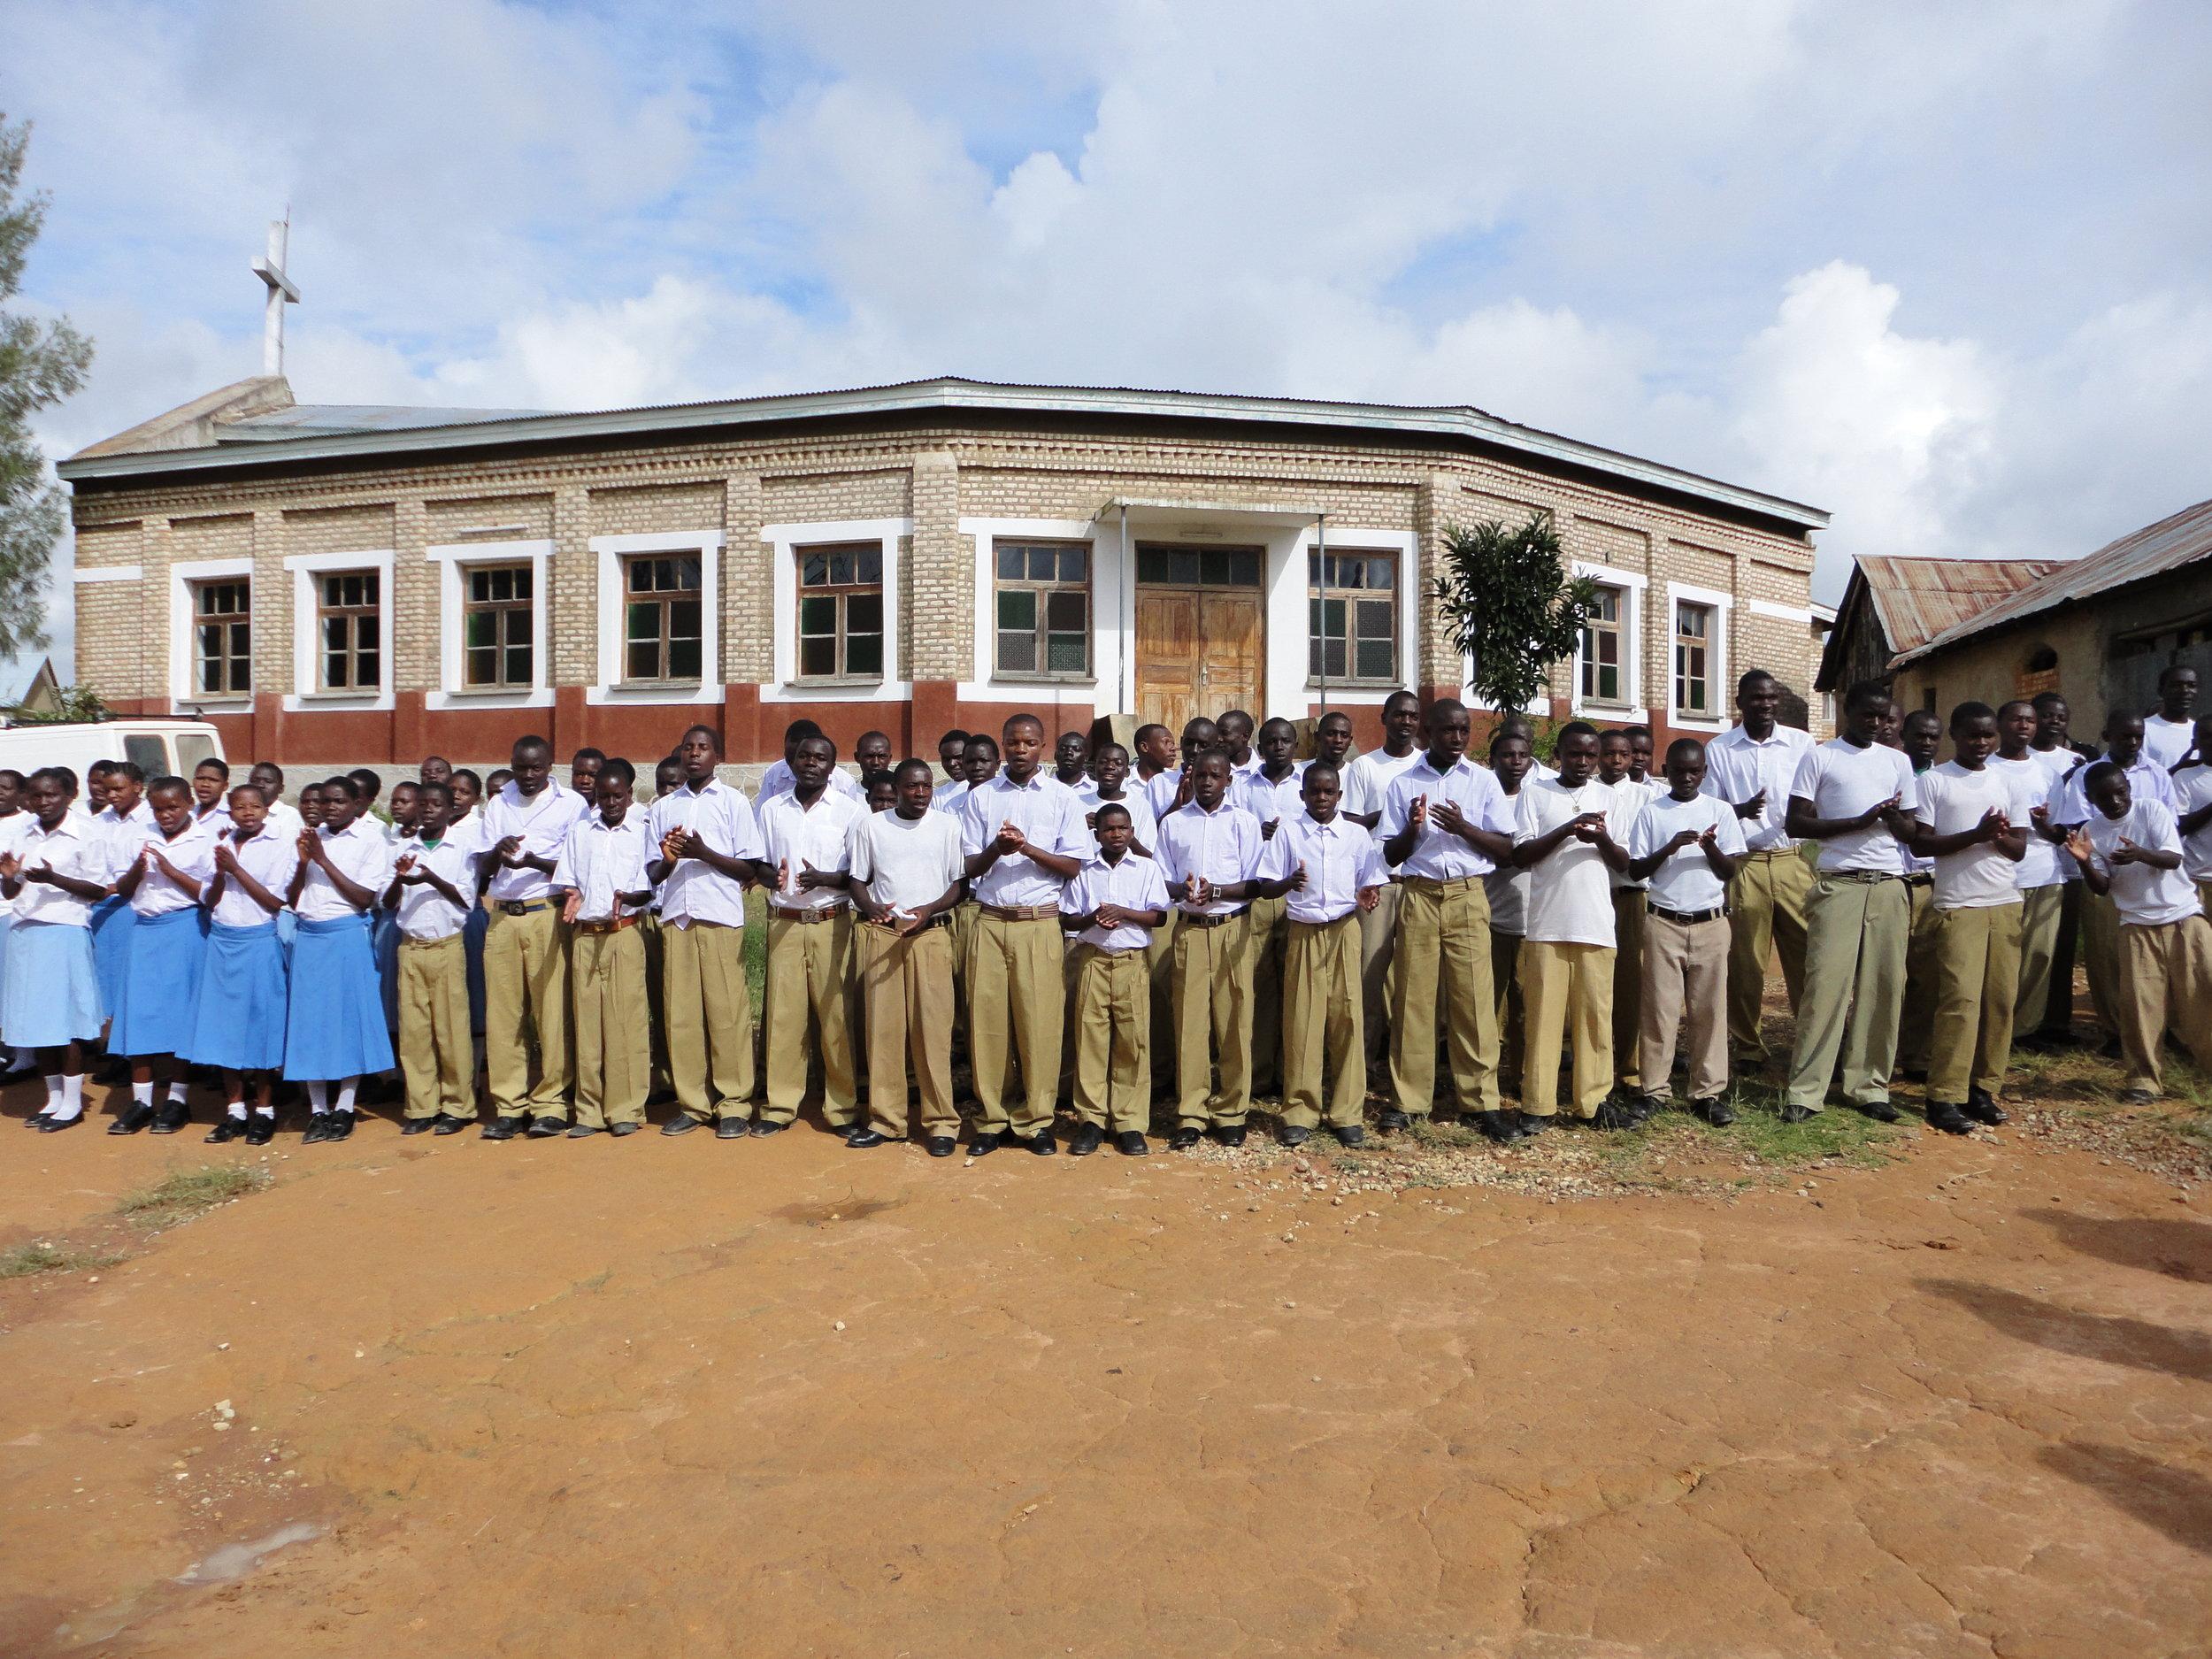 DSC00071 welcome from Ifunda VTC children.JPG